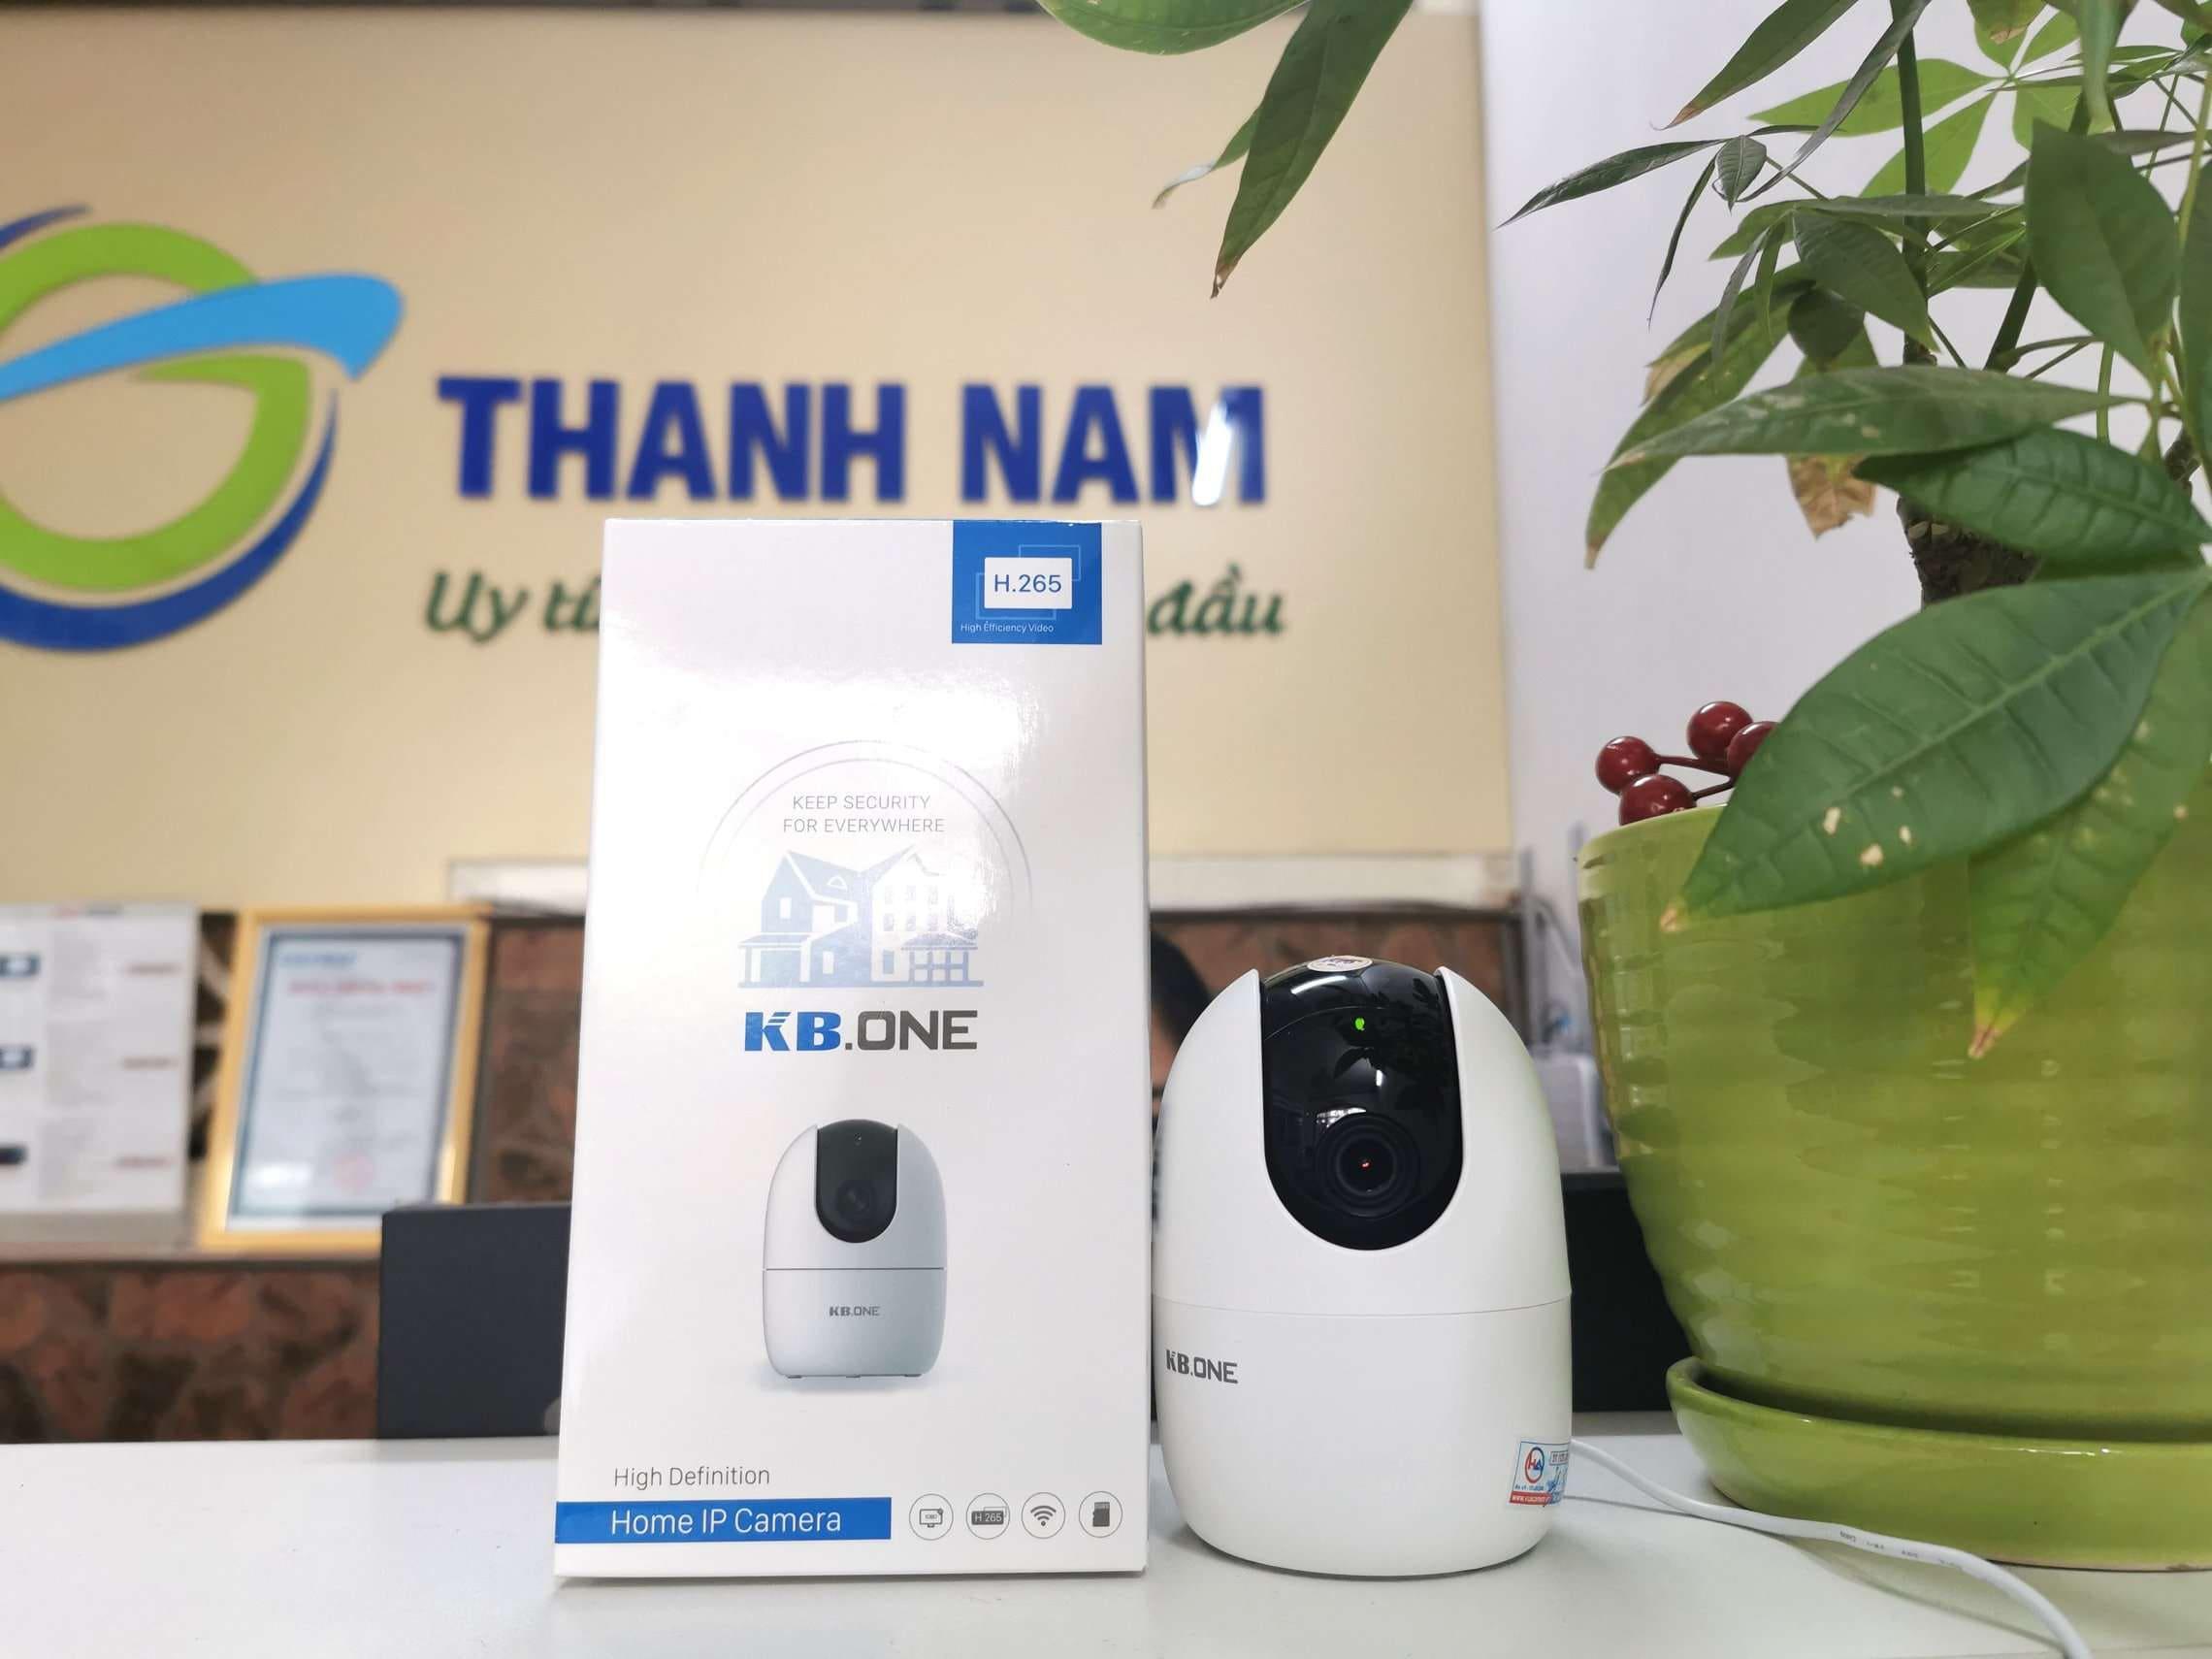 camera giám sát an ninh giá rẻ kbone